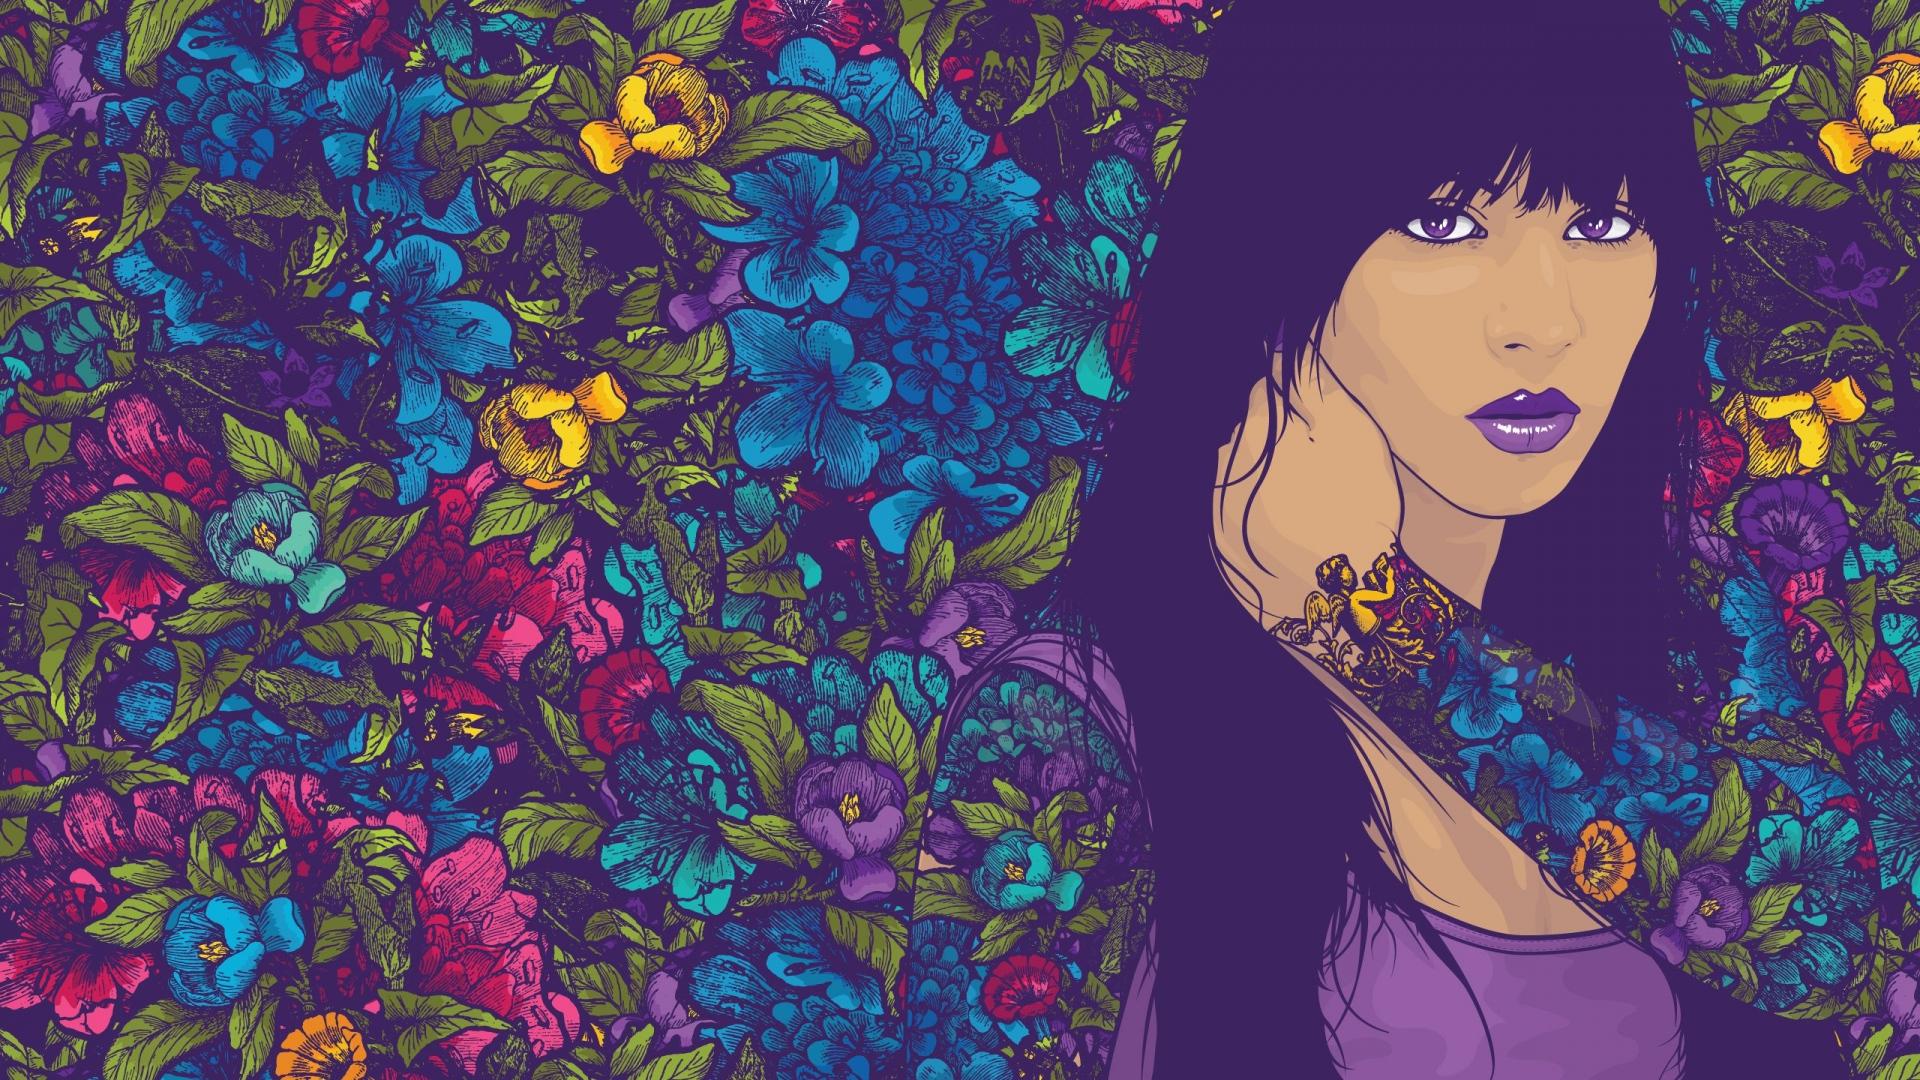 Love Wallpaper Painting : Tattoo Studio Windows 10 Wallpaper - Vector HD 1920x1080 ...